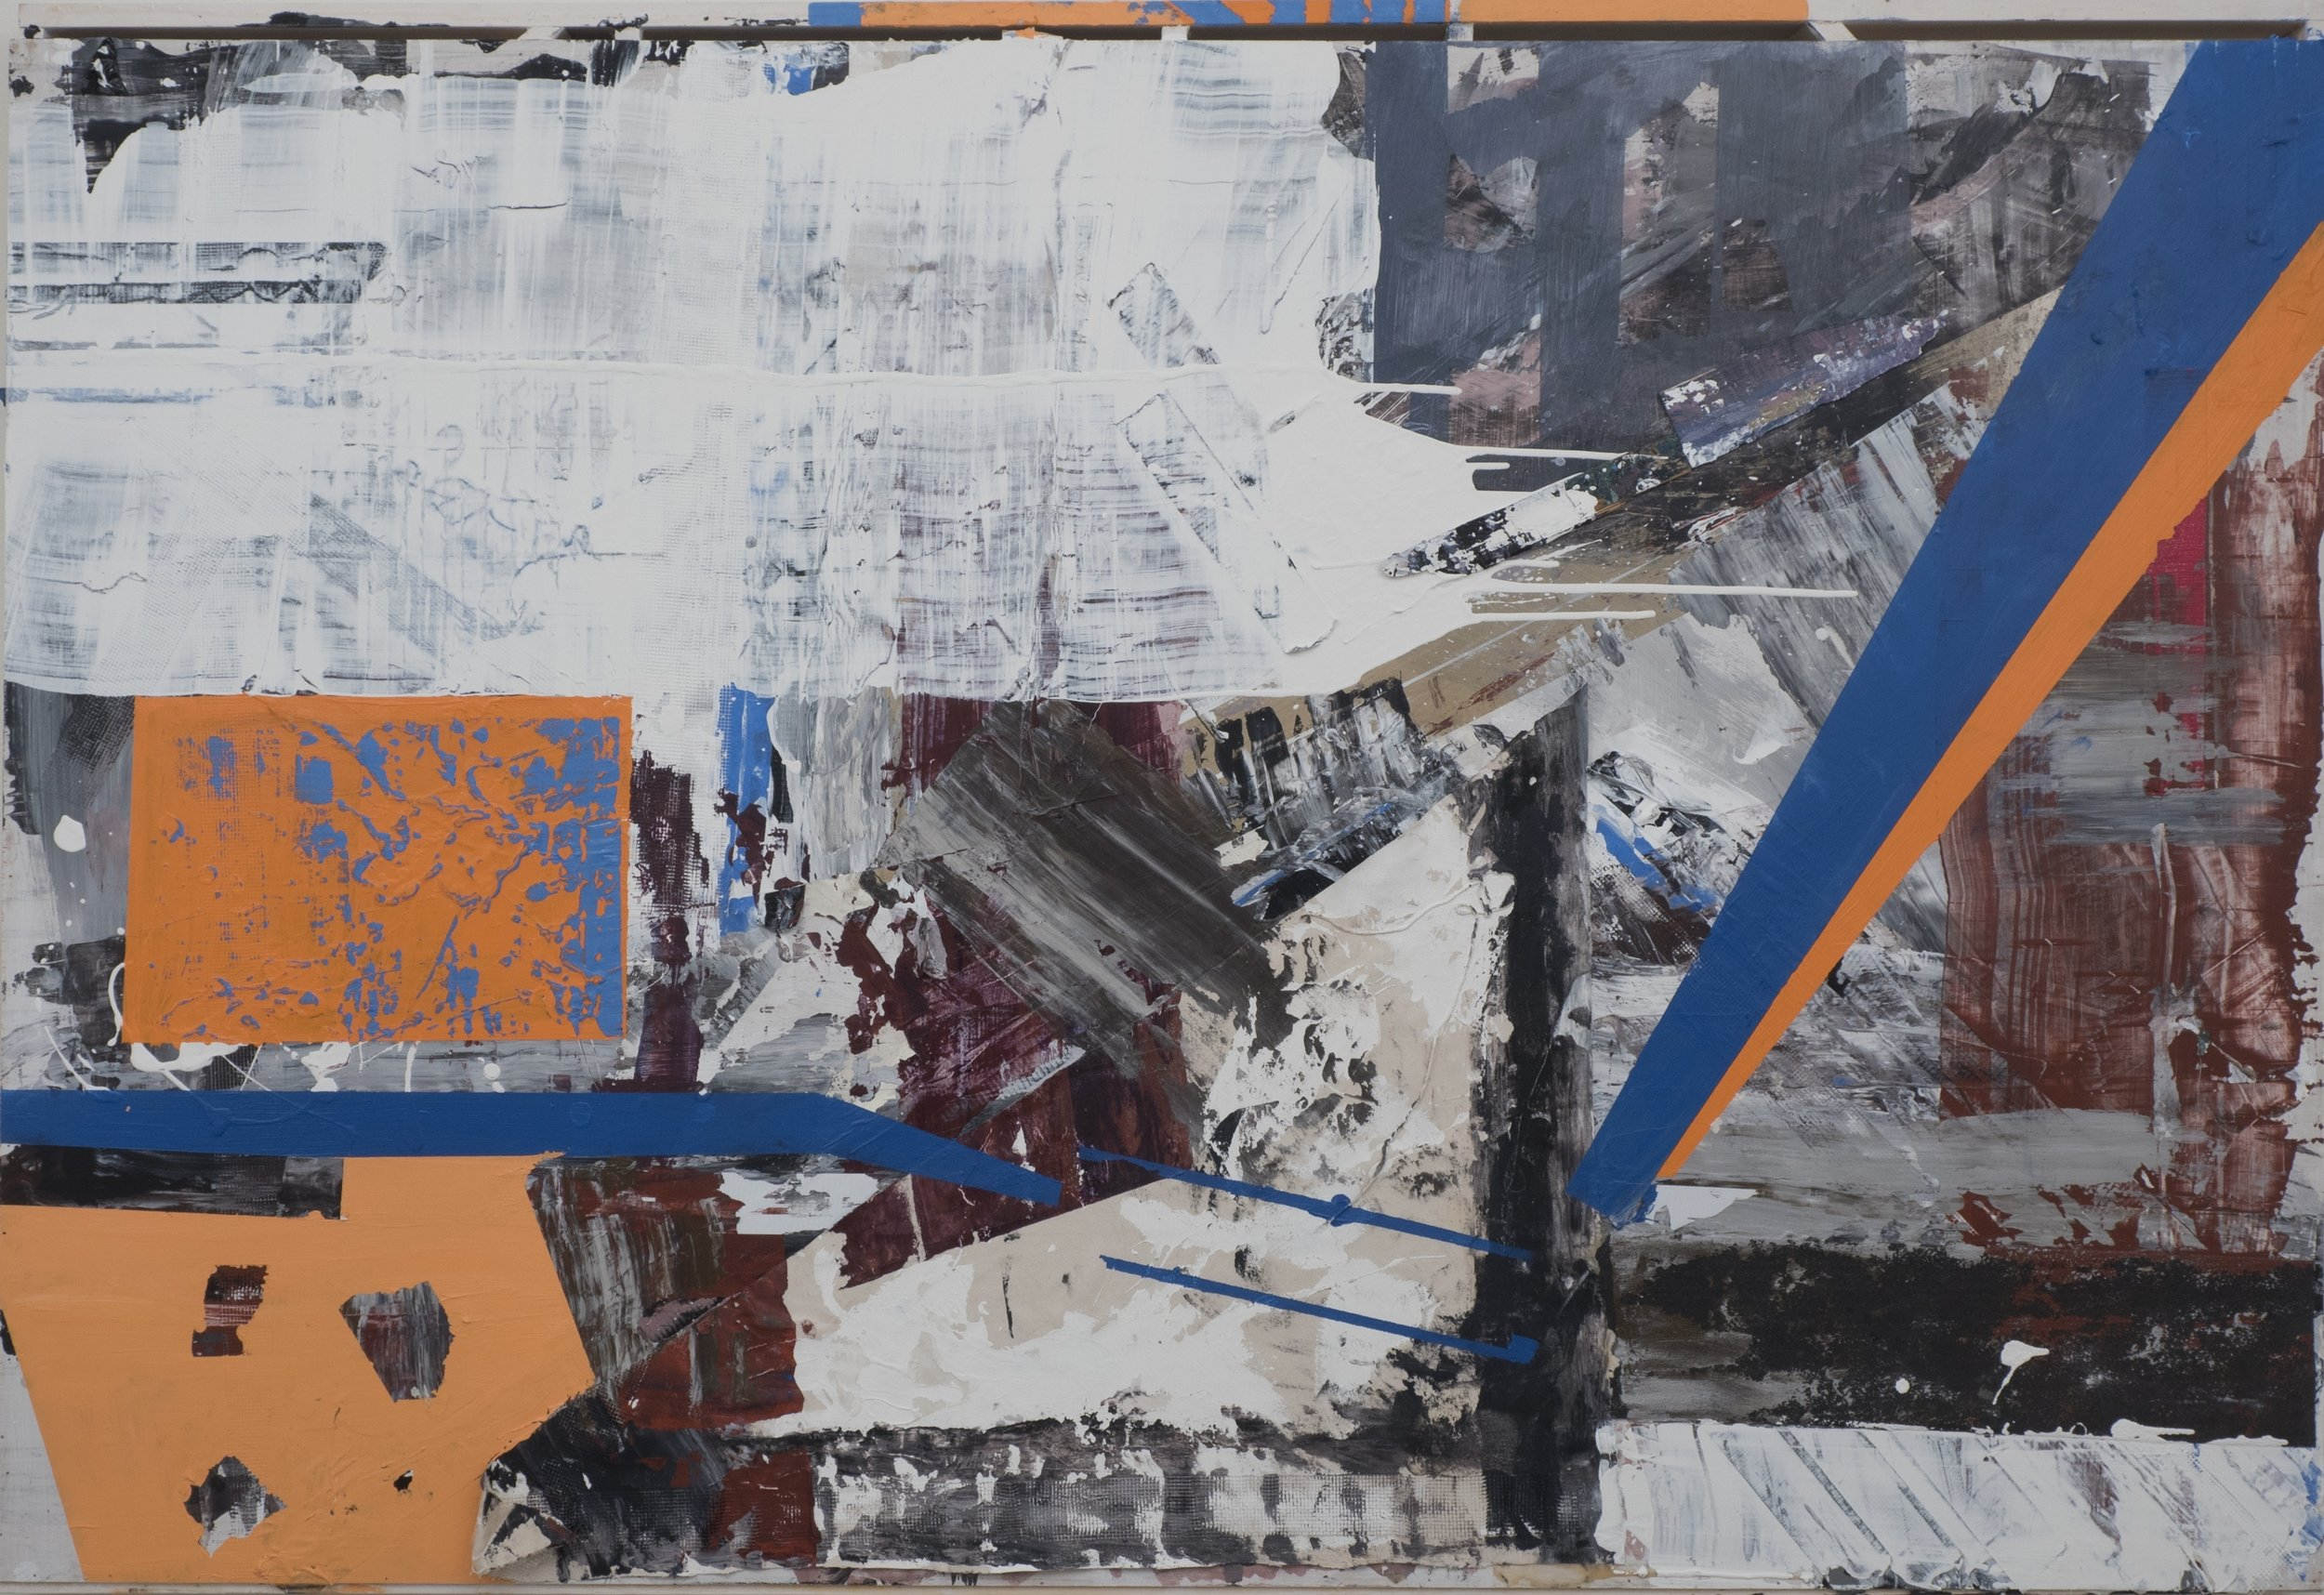 1/12, 2015, Josh Reyes, 4'x6', Acyrlic, Canvas, Tape, and Gesso on Wood Panel